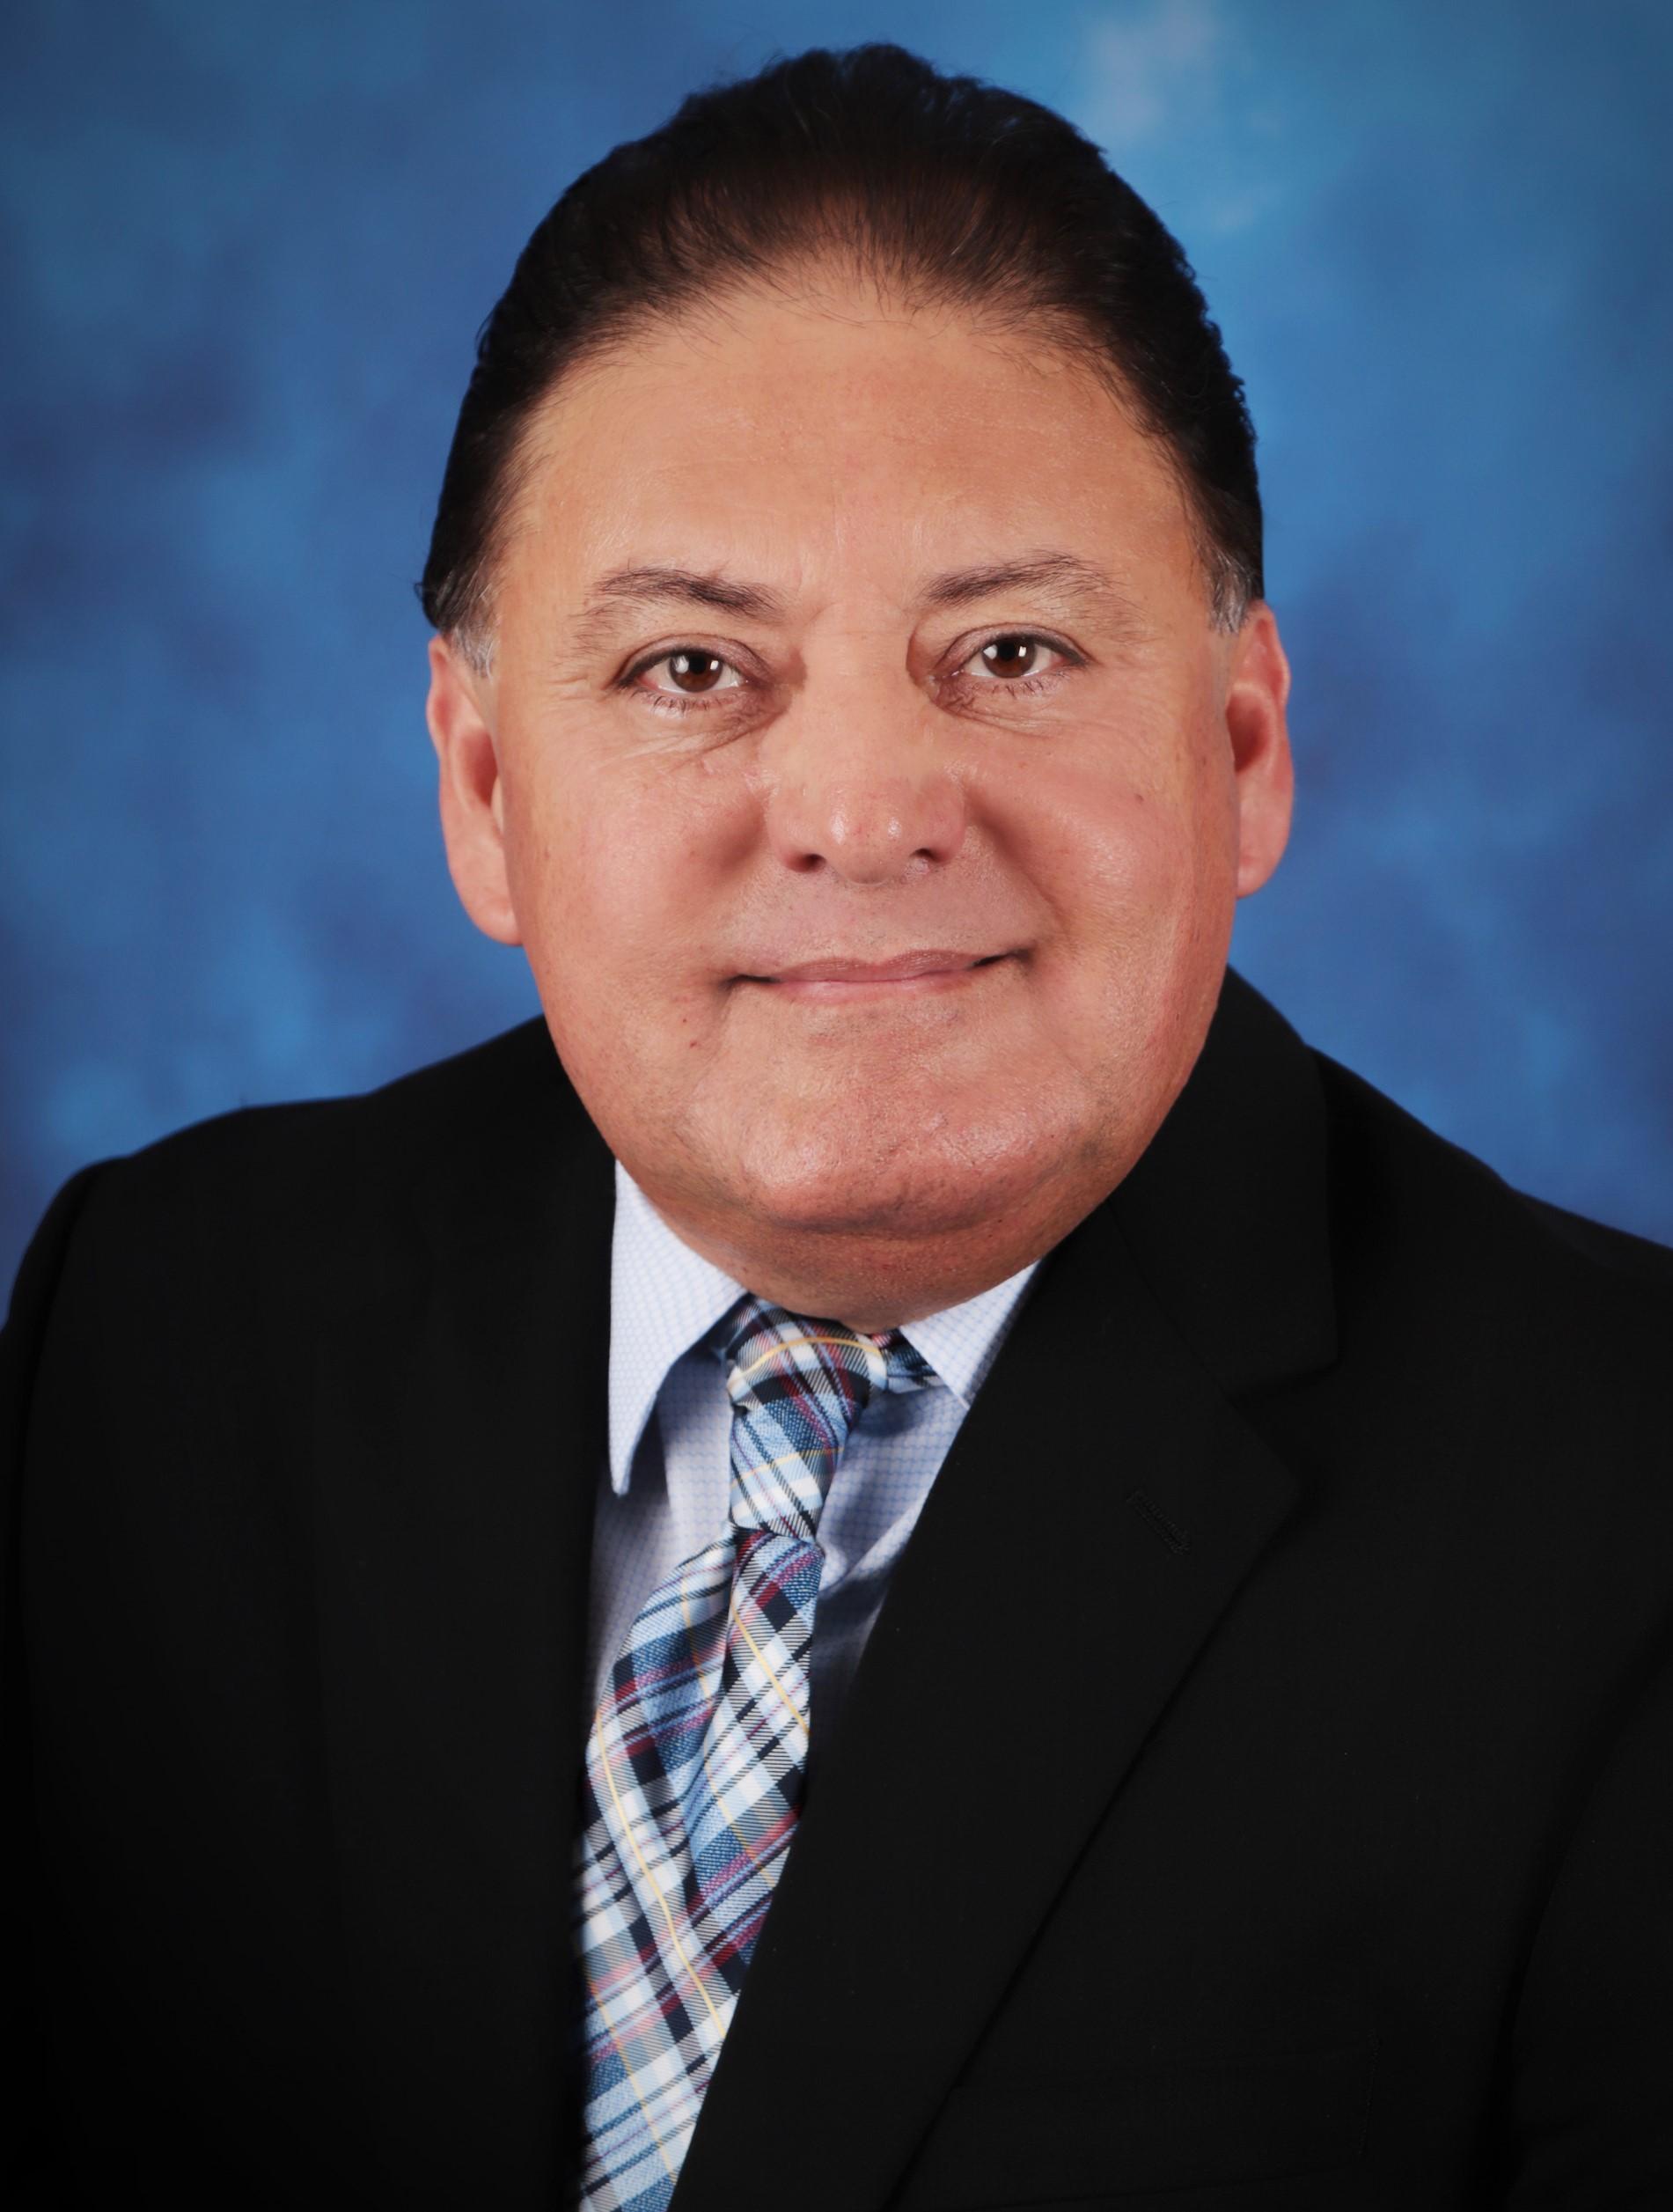 JOSE C. MENDOZA Financial Professional & Insurance Agent